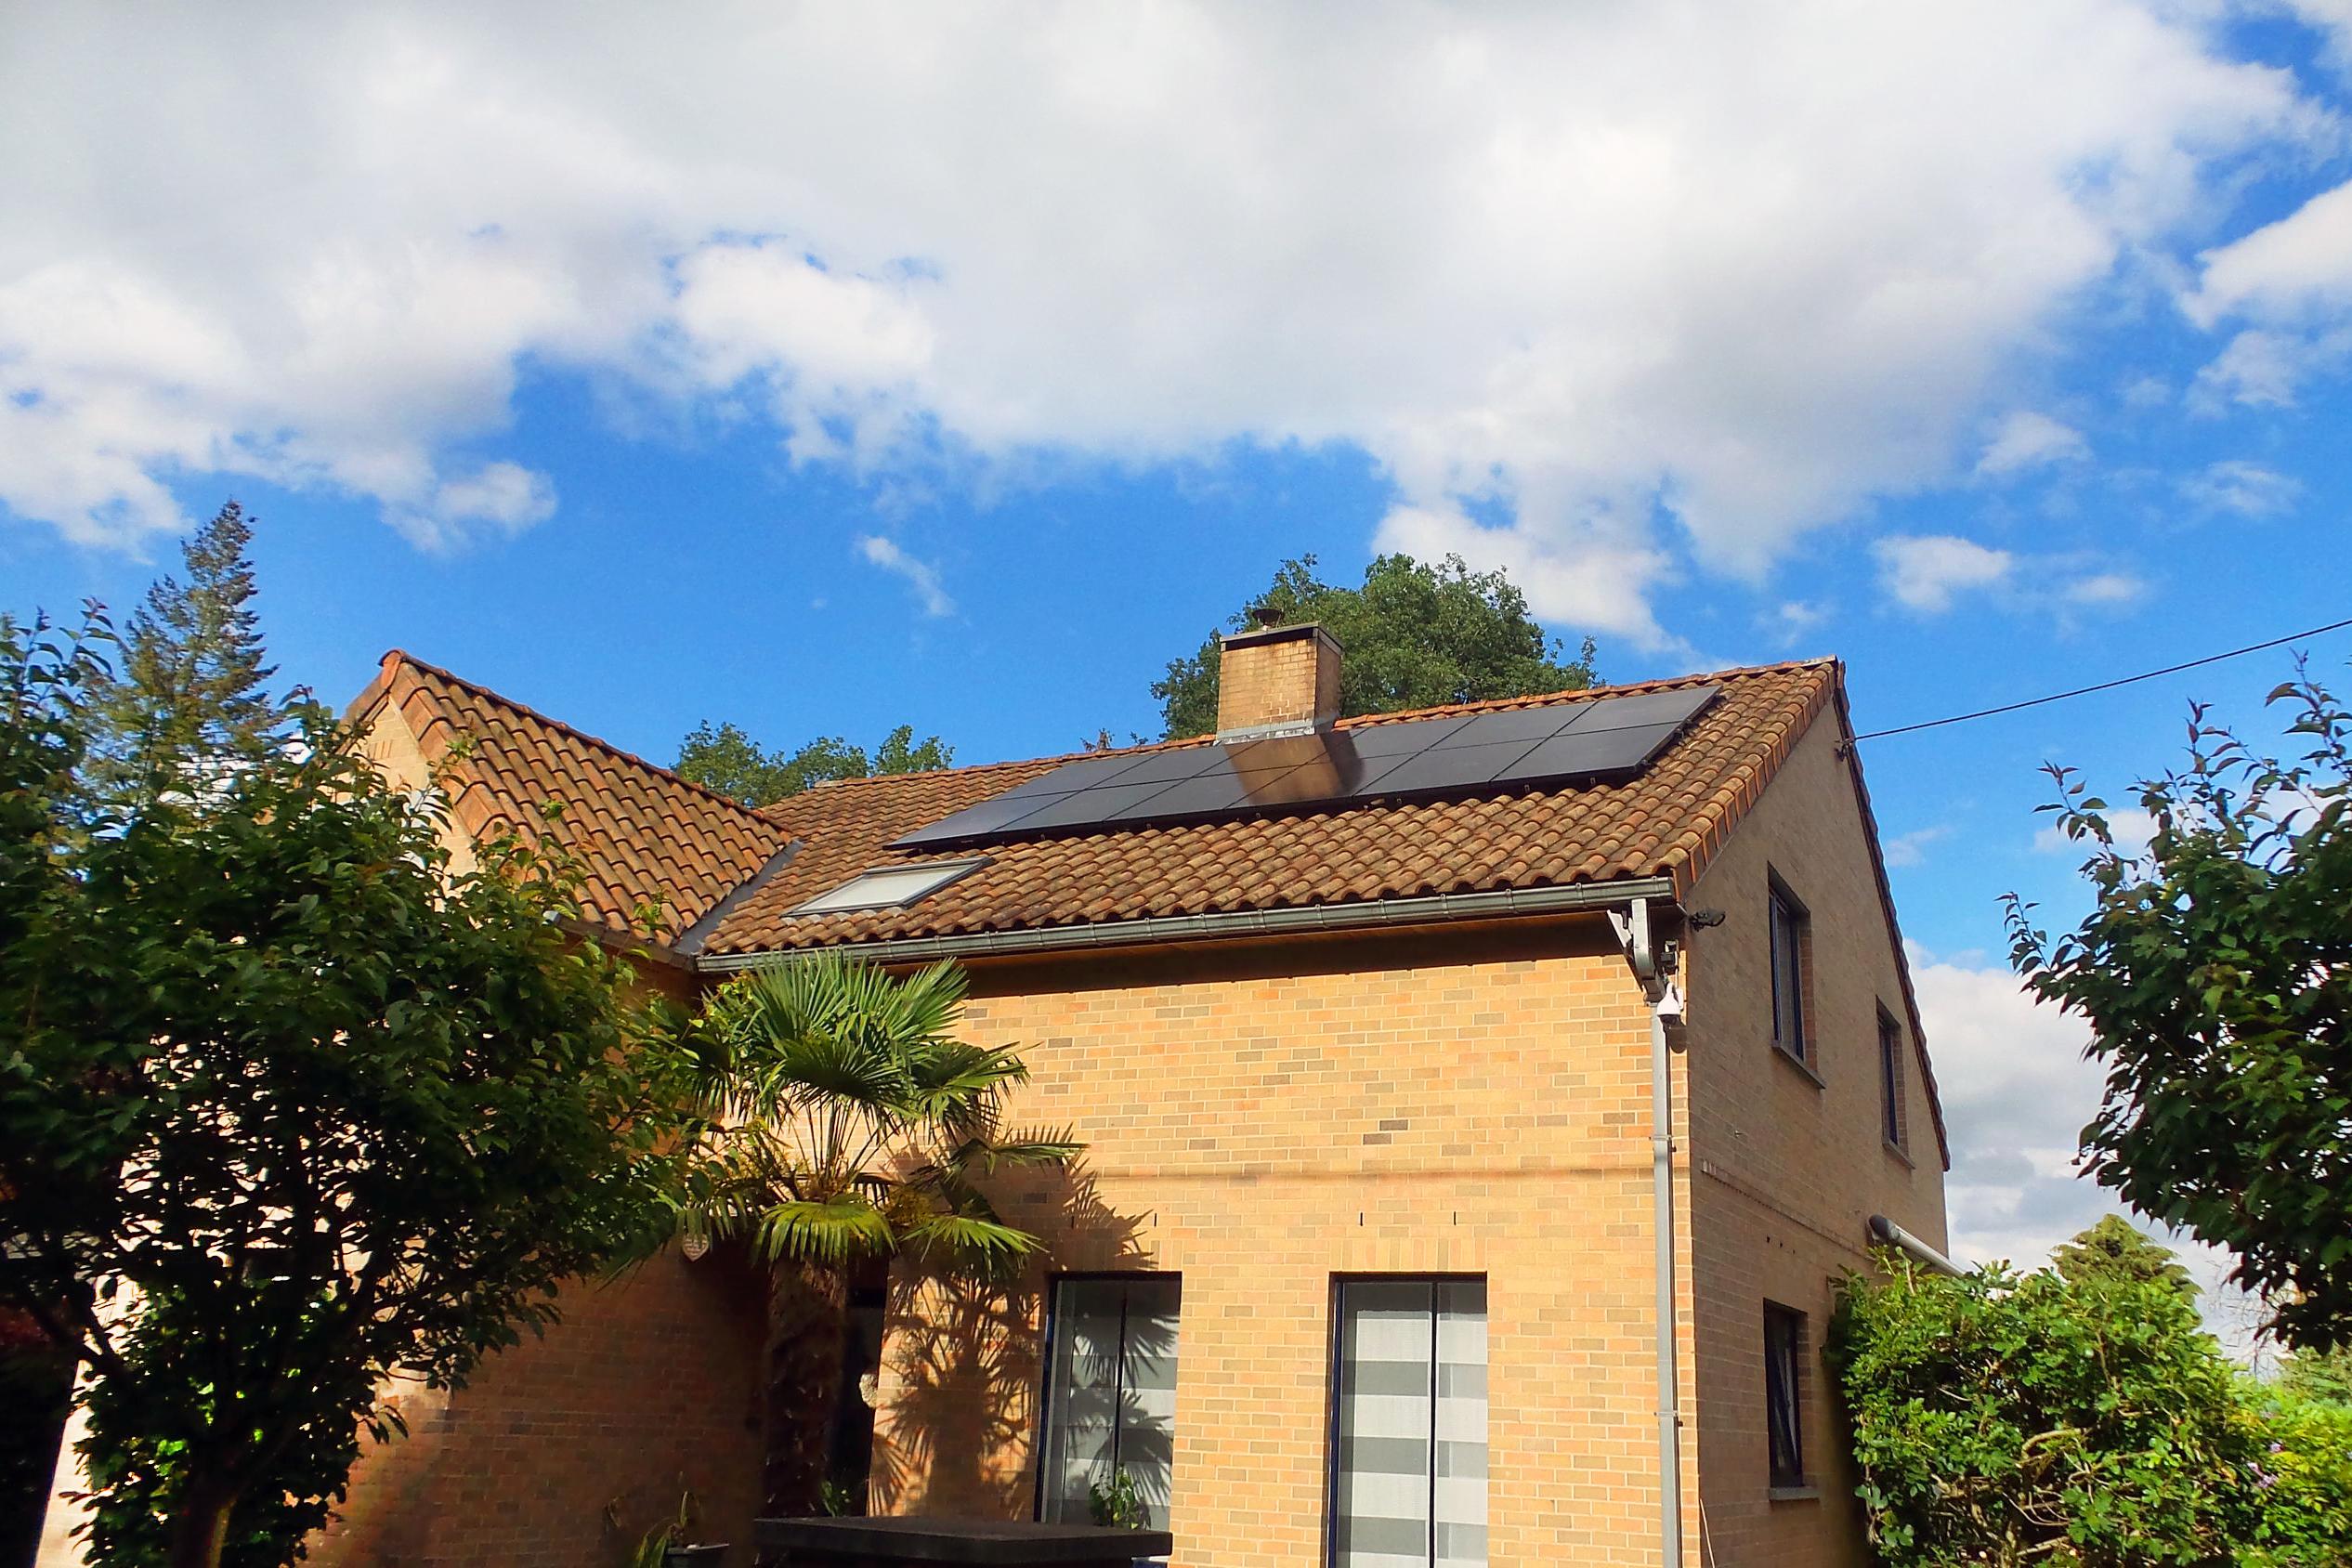 Installation panneaux photovoltaïques Sunpower Energreen